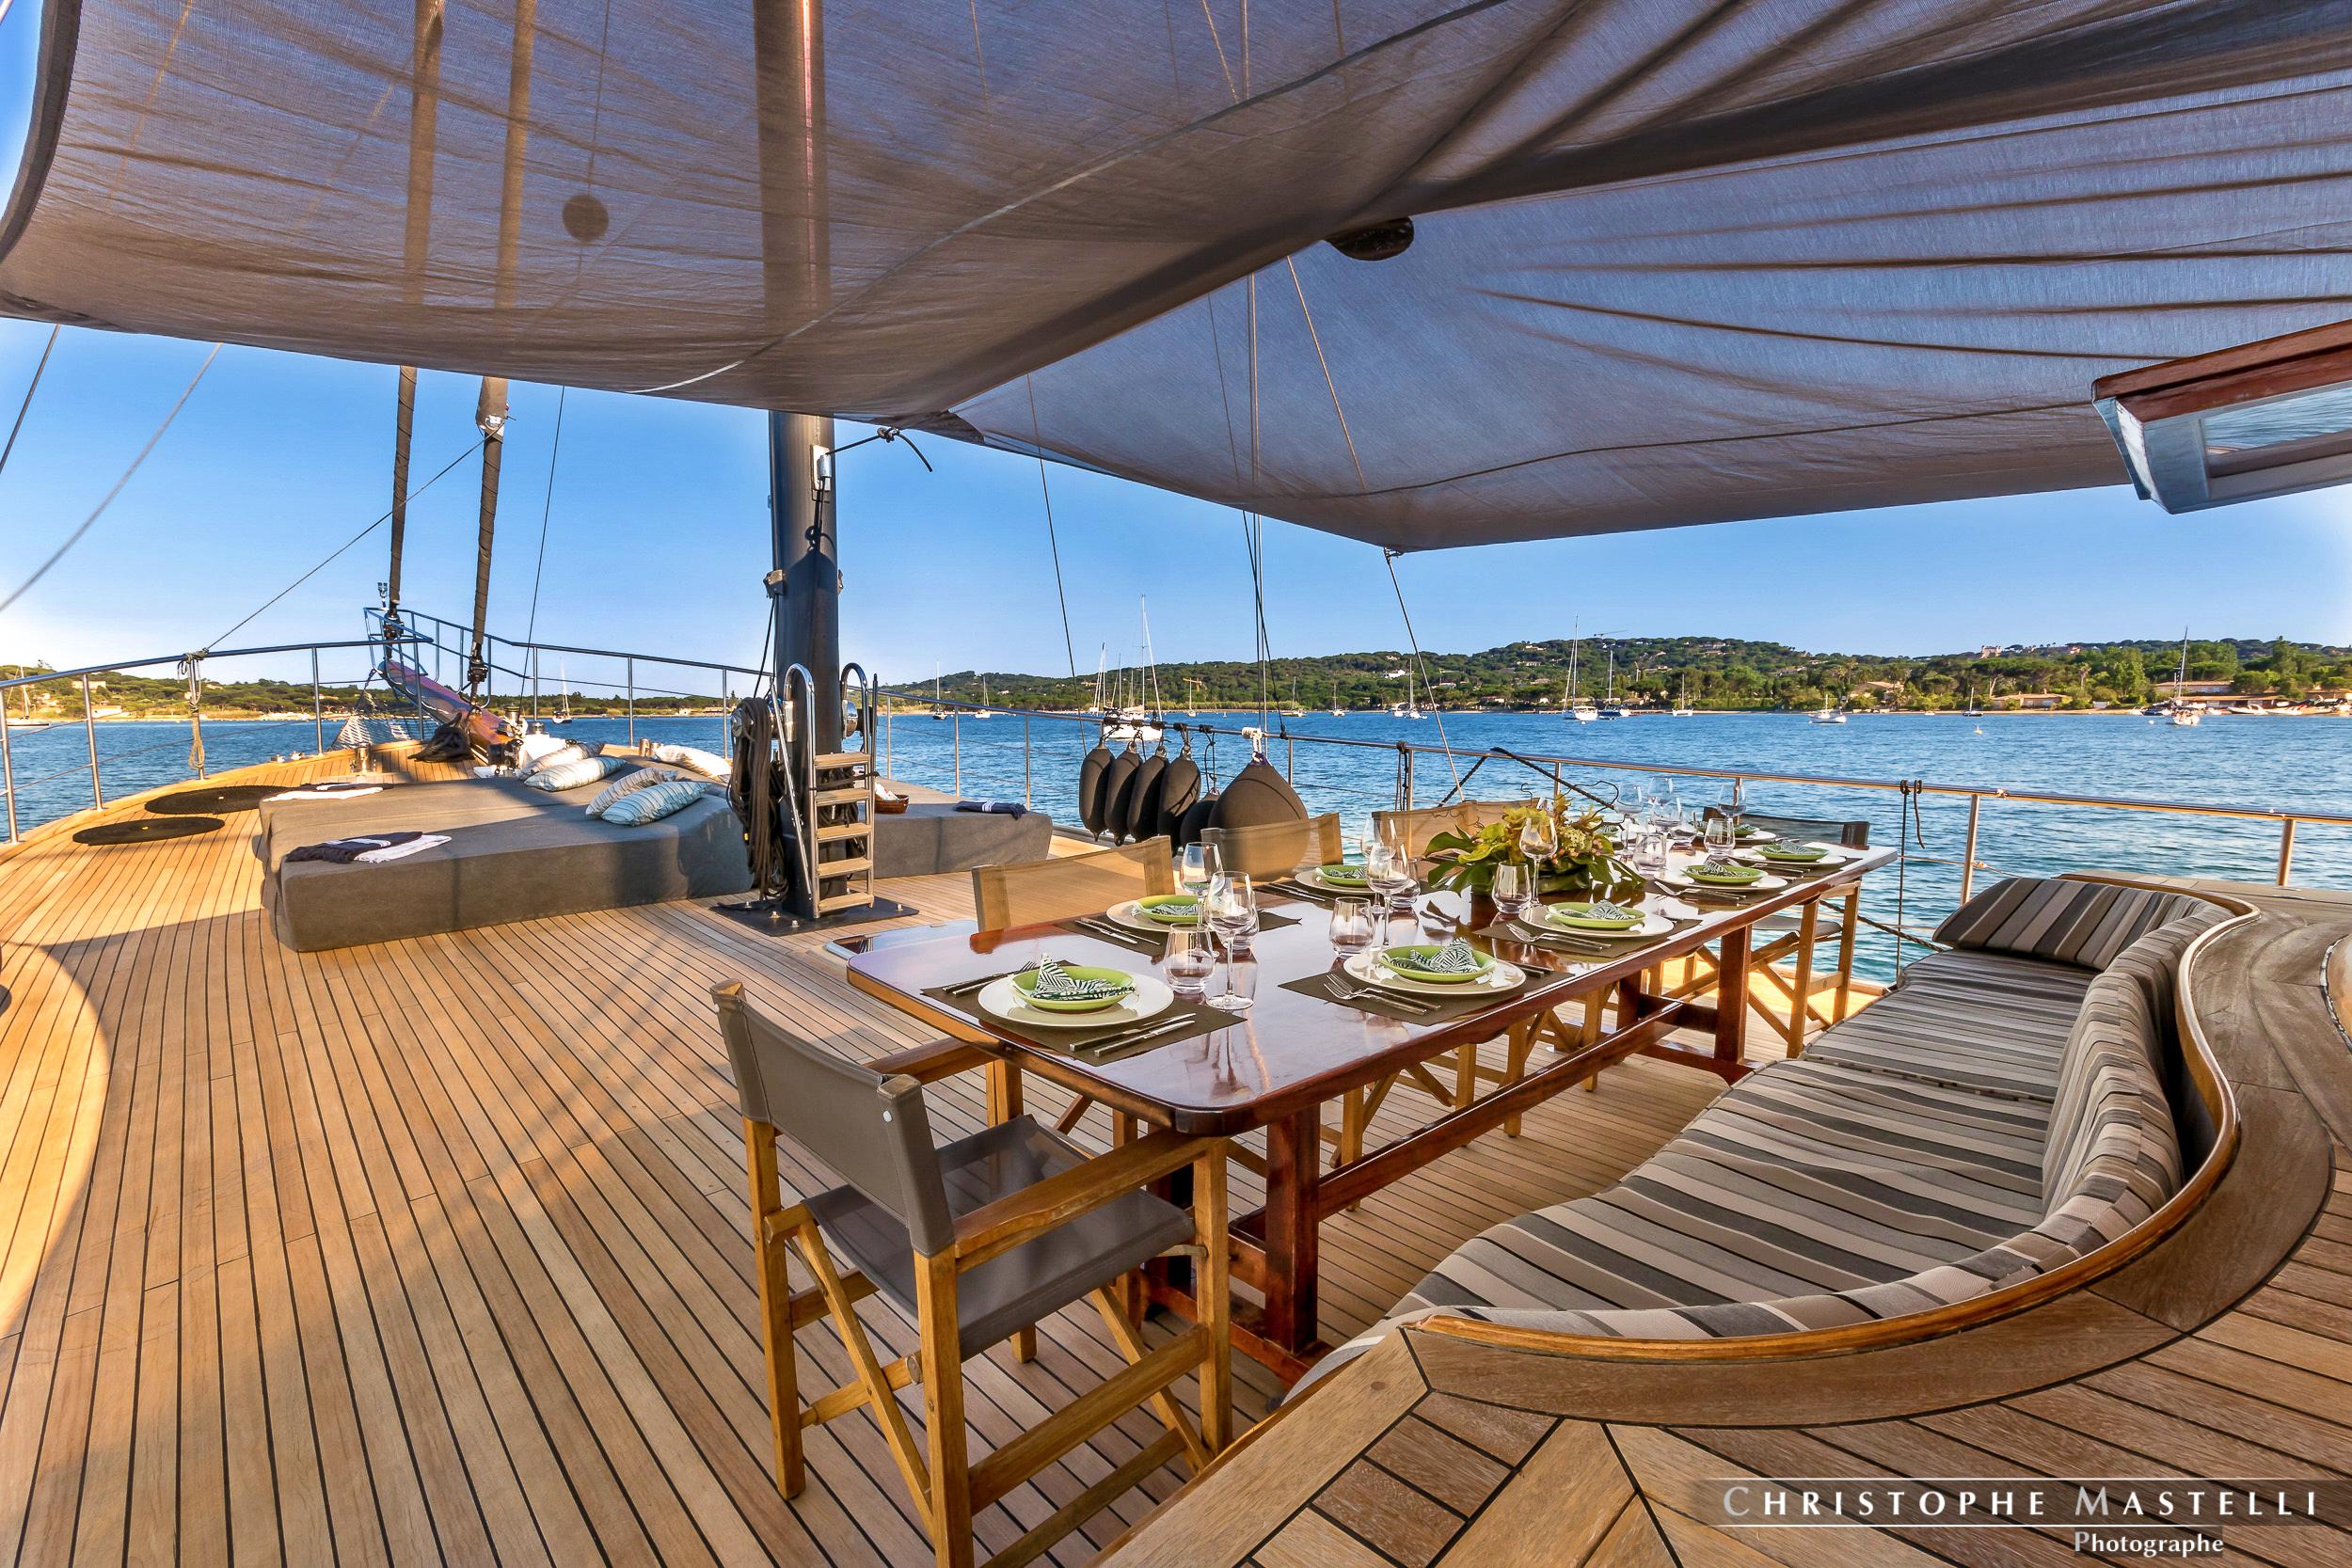 luxury-yacht-brokers-charters-christophe-mastelli-photographe